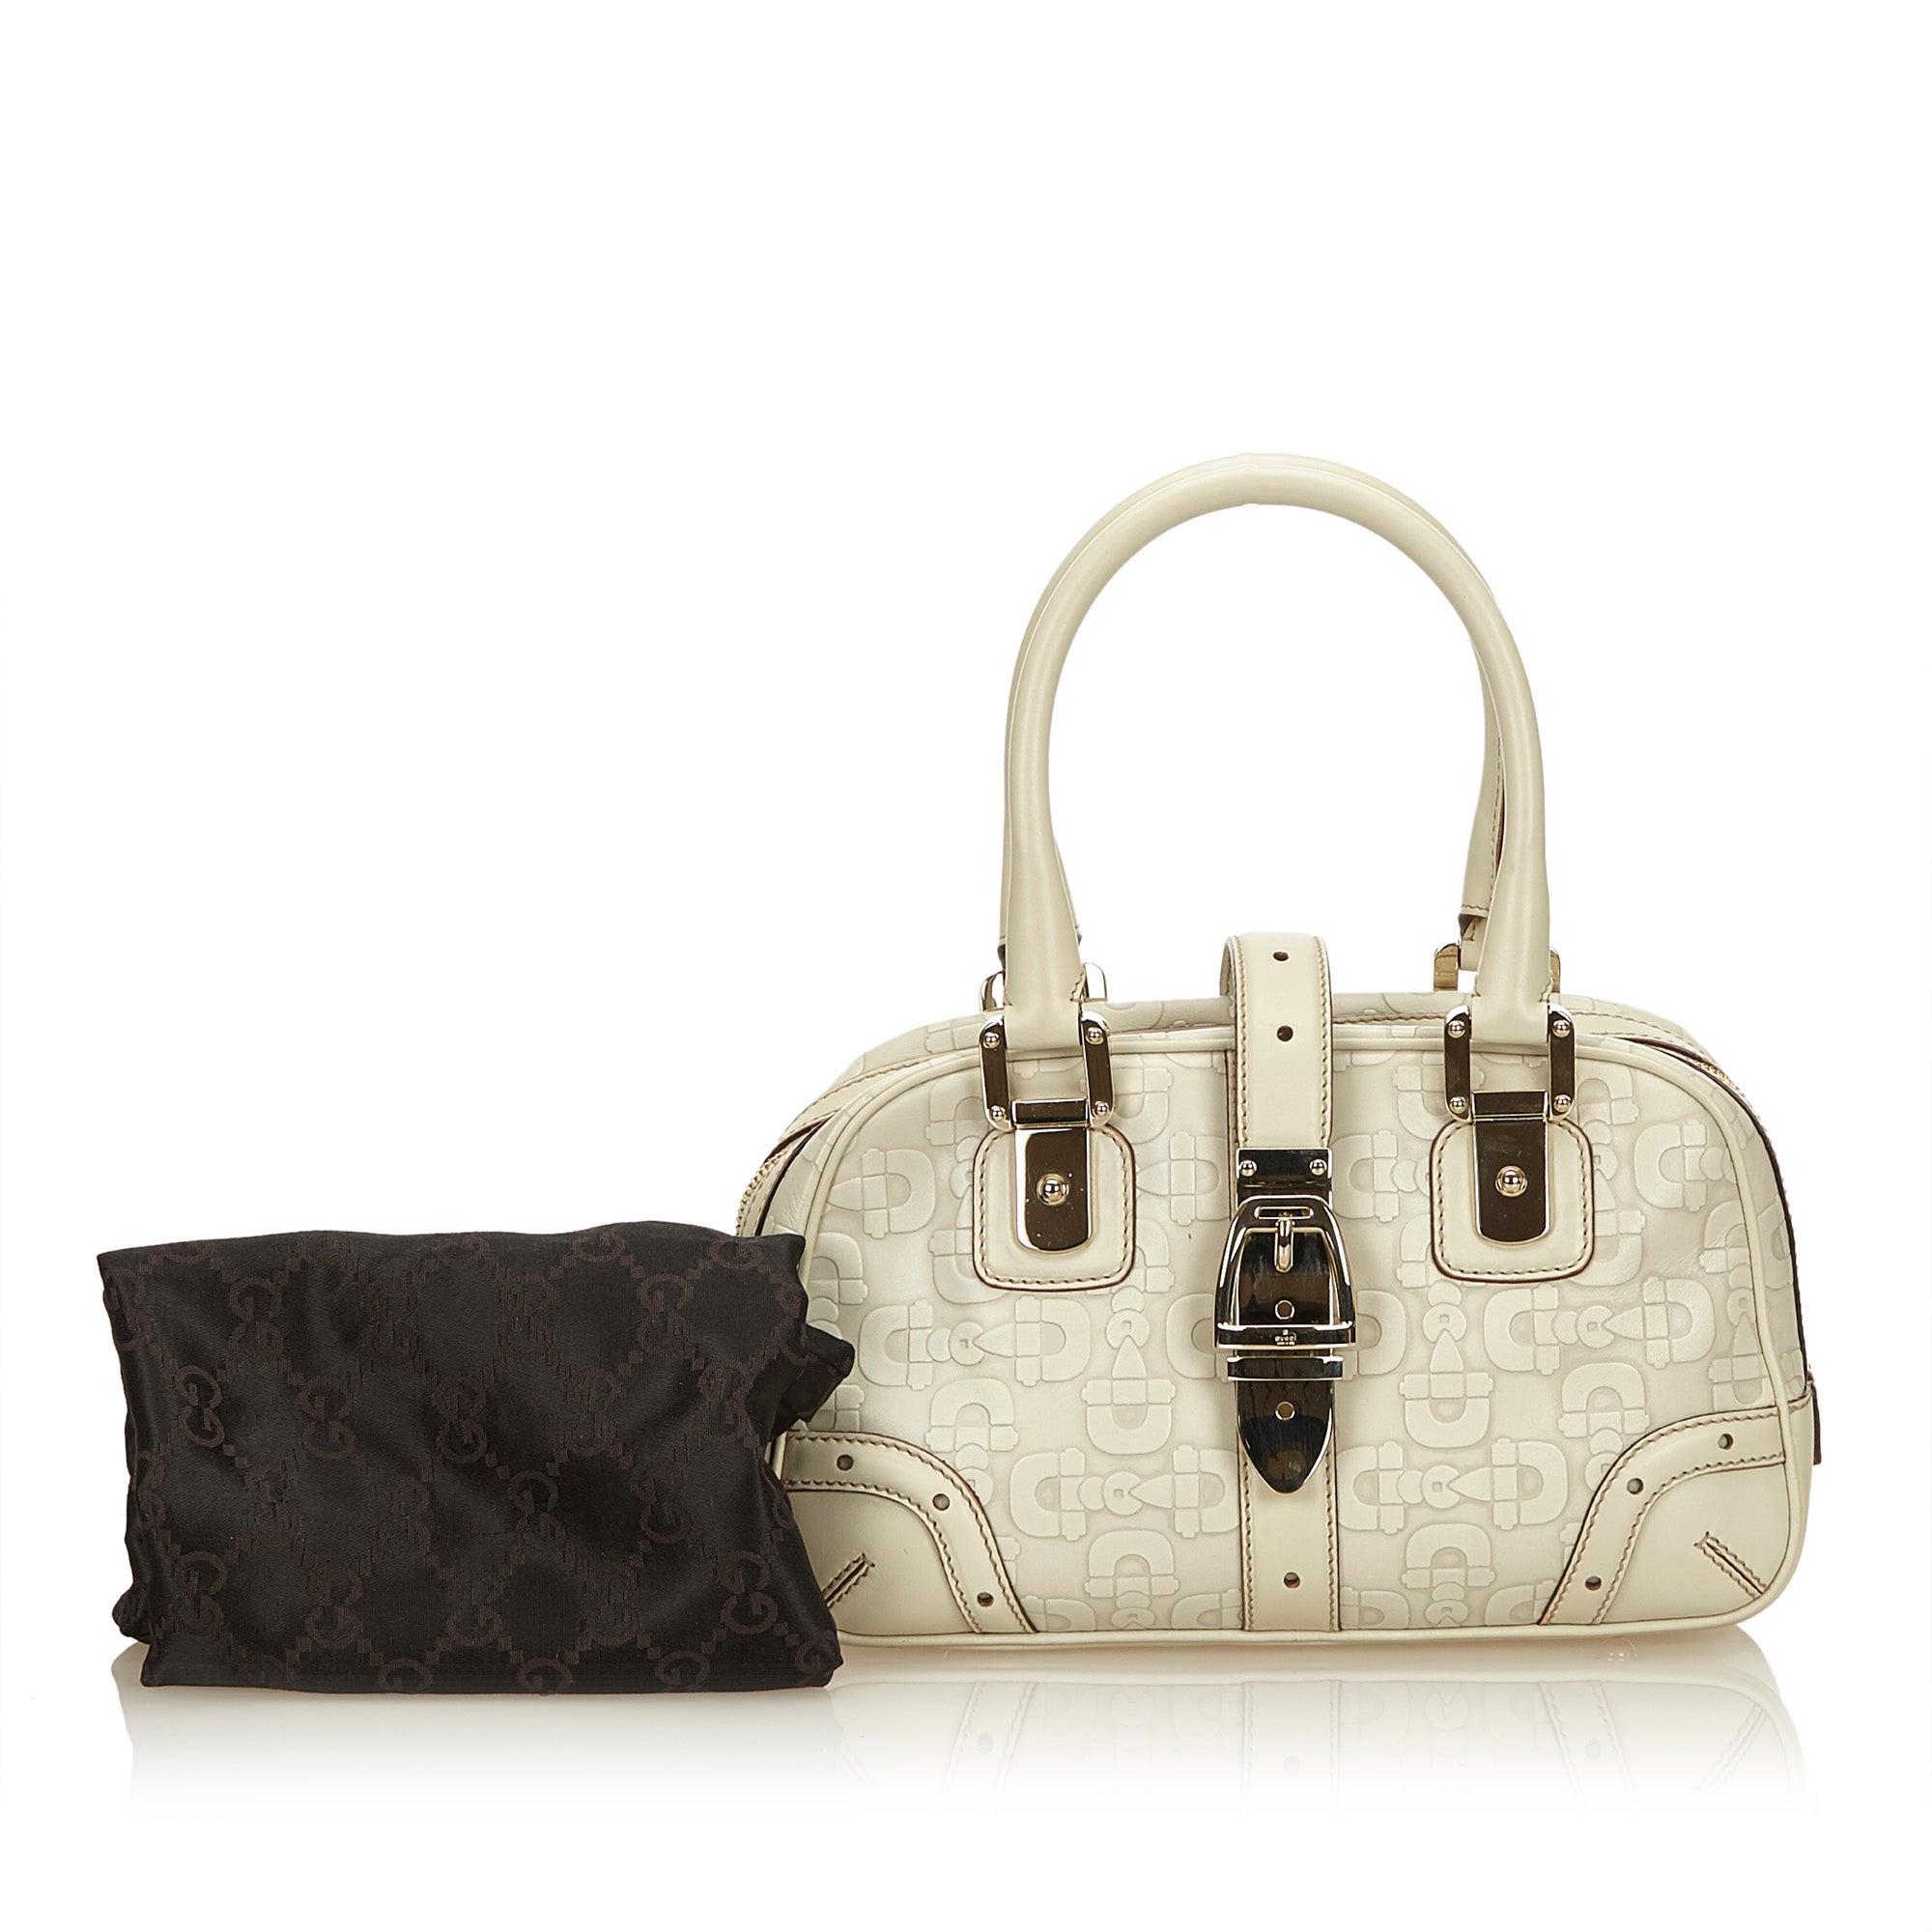 ba4d8212ec22 ... Gucci White Leather Horsebit Handbag For Sale at 1stdibs